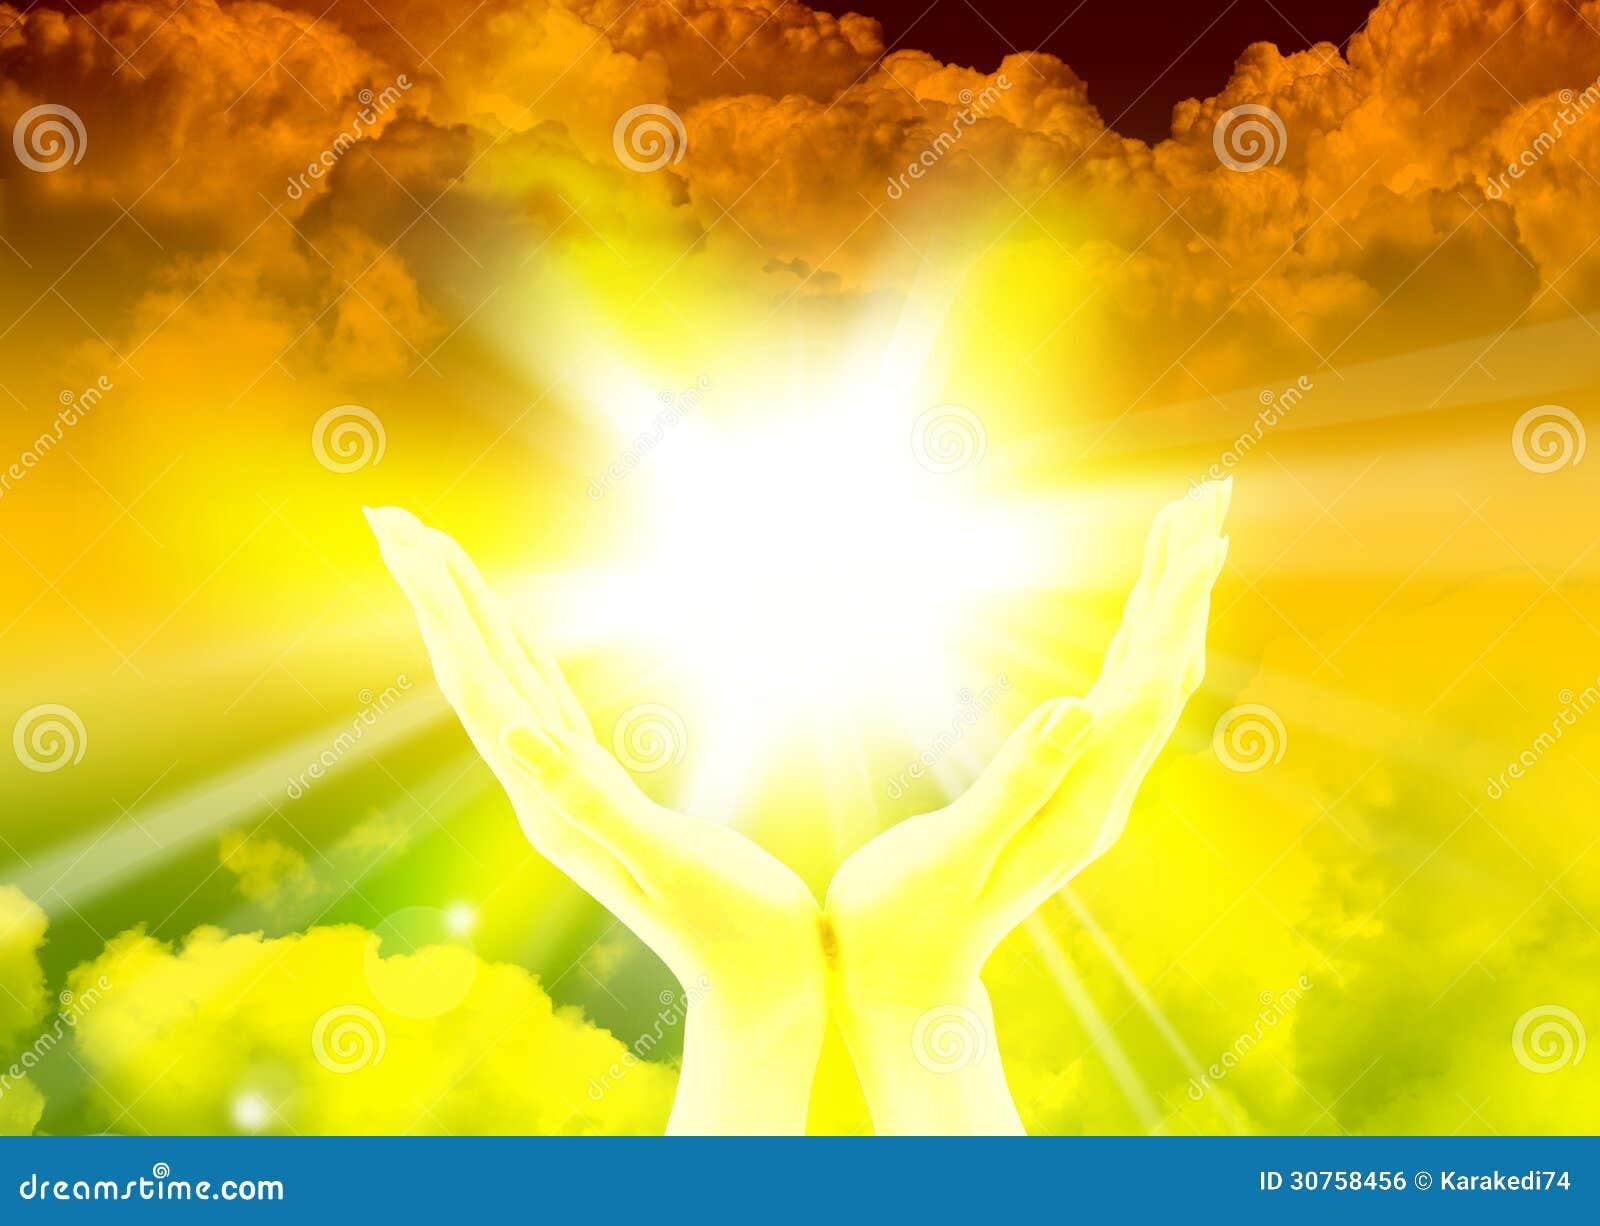 Prayer Hands Praying Faith Royalty Free Stock Image - Image: 30758456